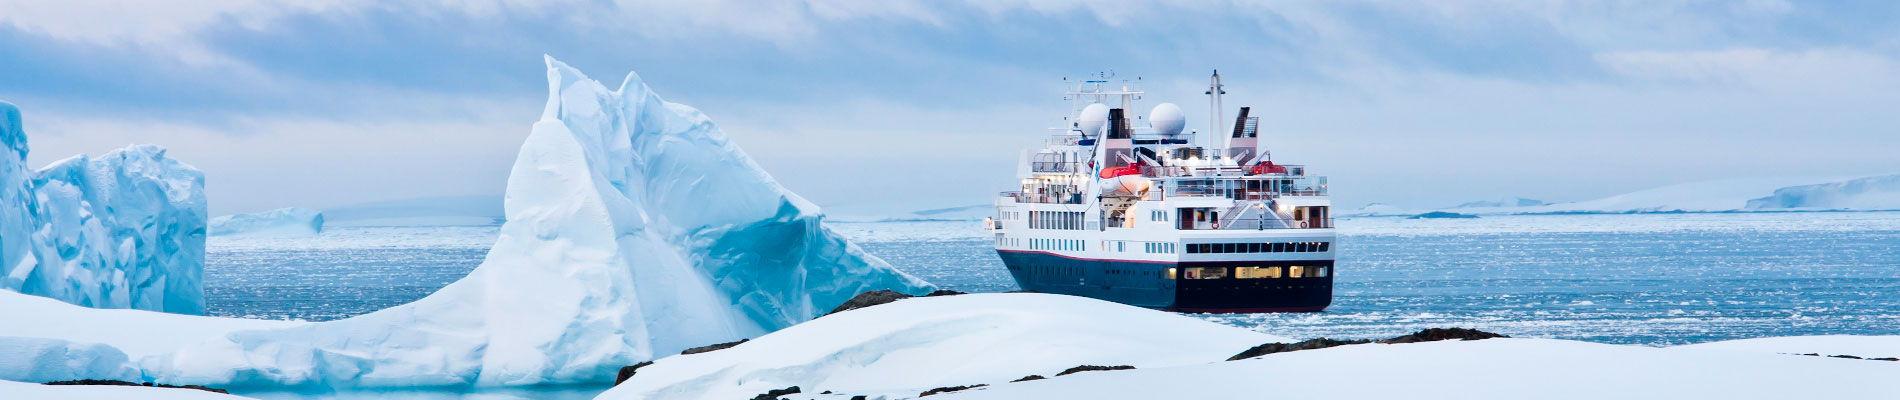 antarctique-iceberg-bateau-luxe-st(1)